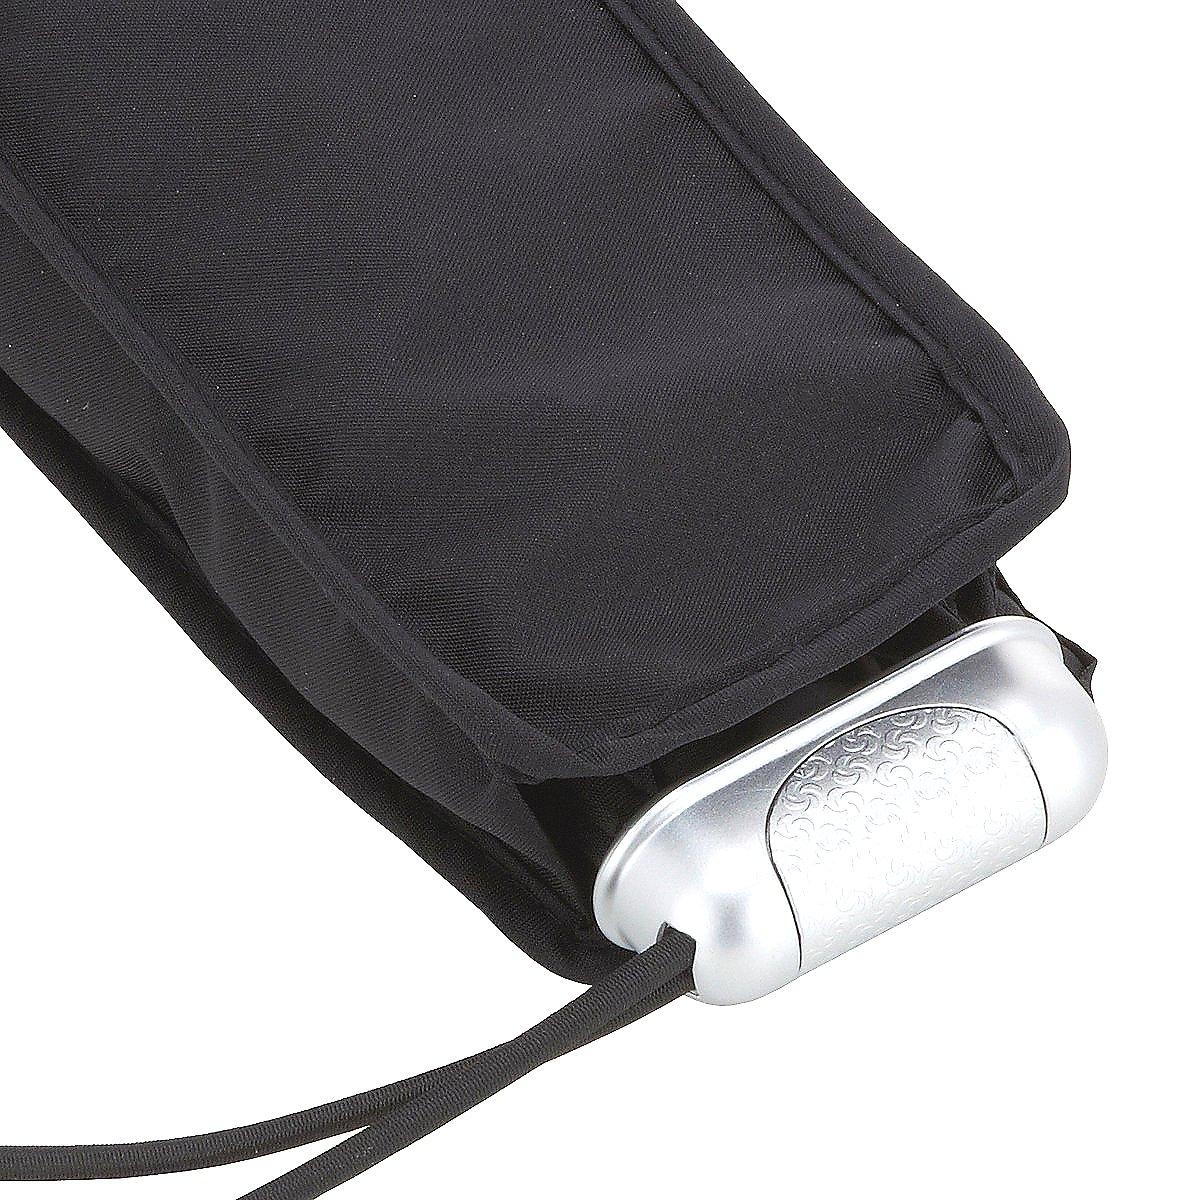 samsonite umbrella alu drop regenschirm manuell koffer. Black Bedroom Furniture Sets. Home Design Ideas